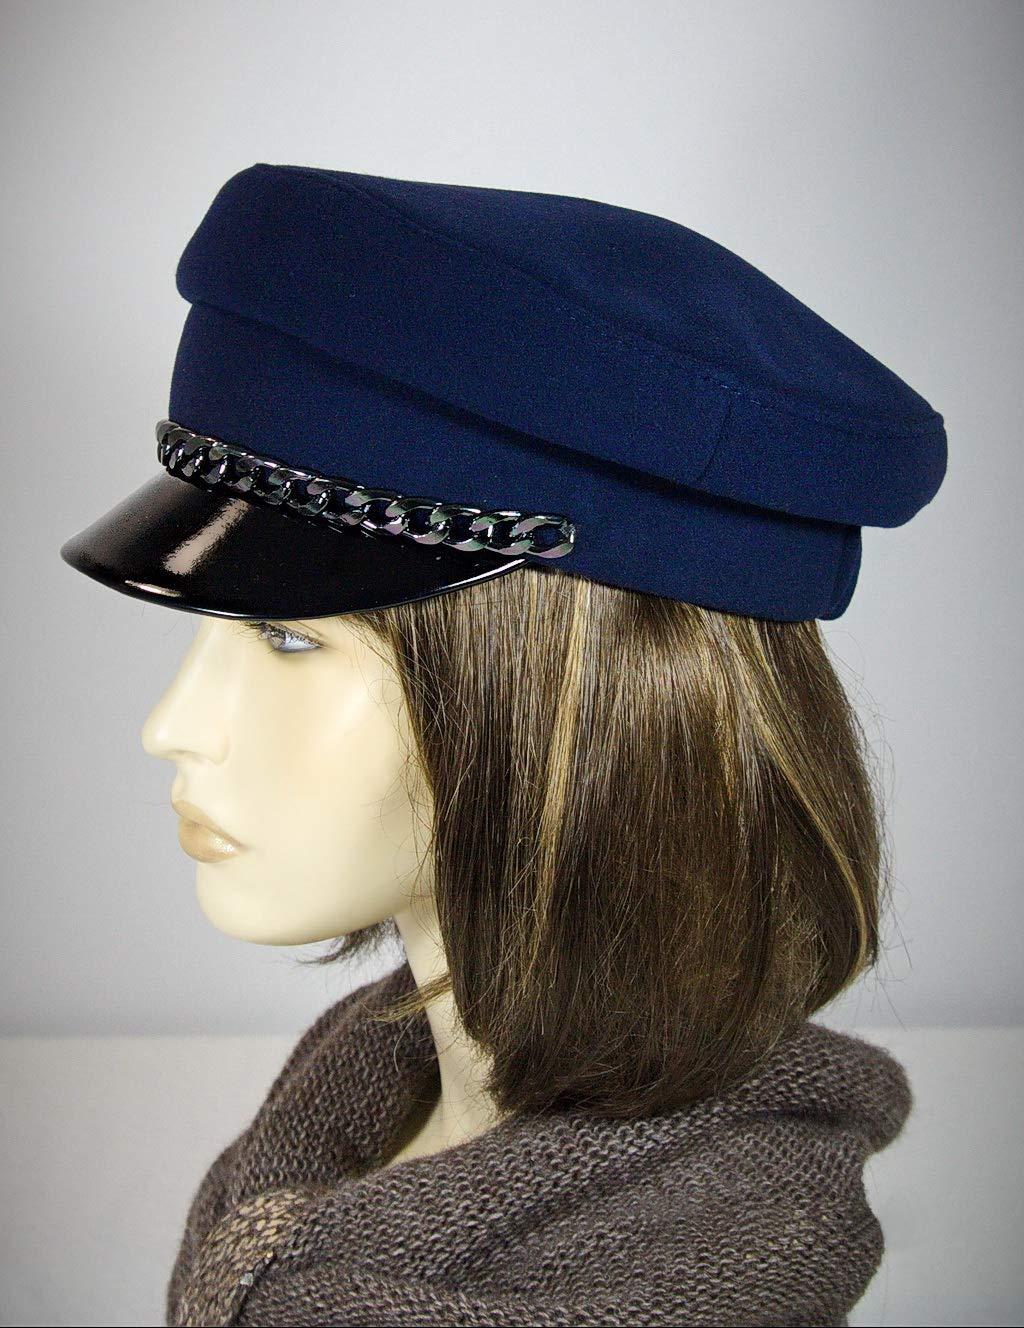 3884be84 Amazon.com: Breton hat, cap with strap, john lennon cap,baker boy cap,  captains hat, breton style, baker cap, blue breton hat, cape breton hat.:  Handmade